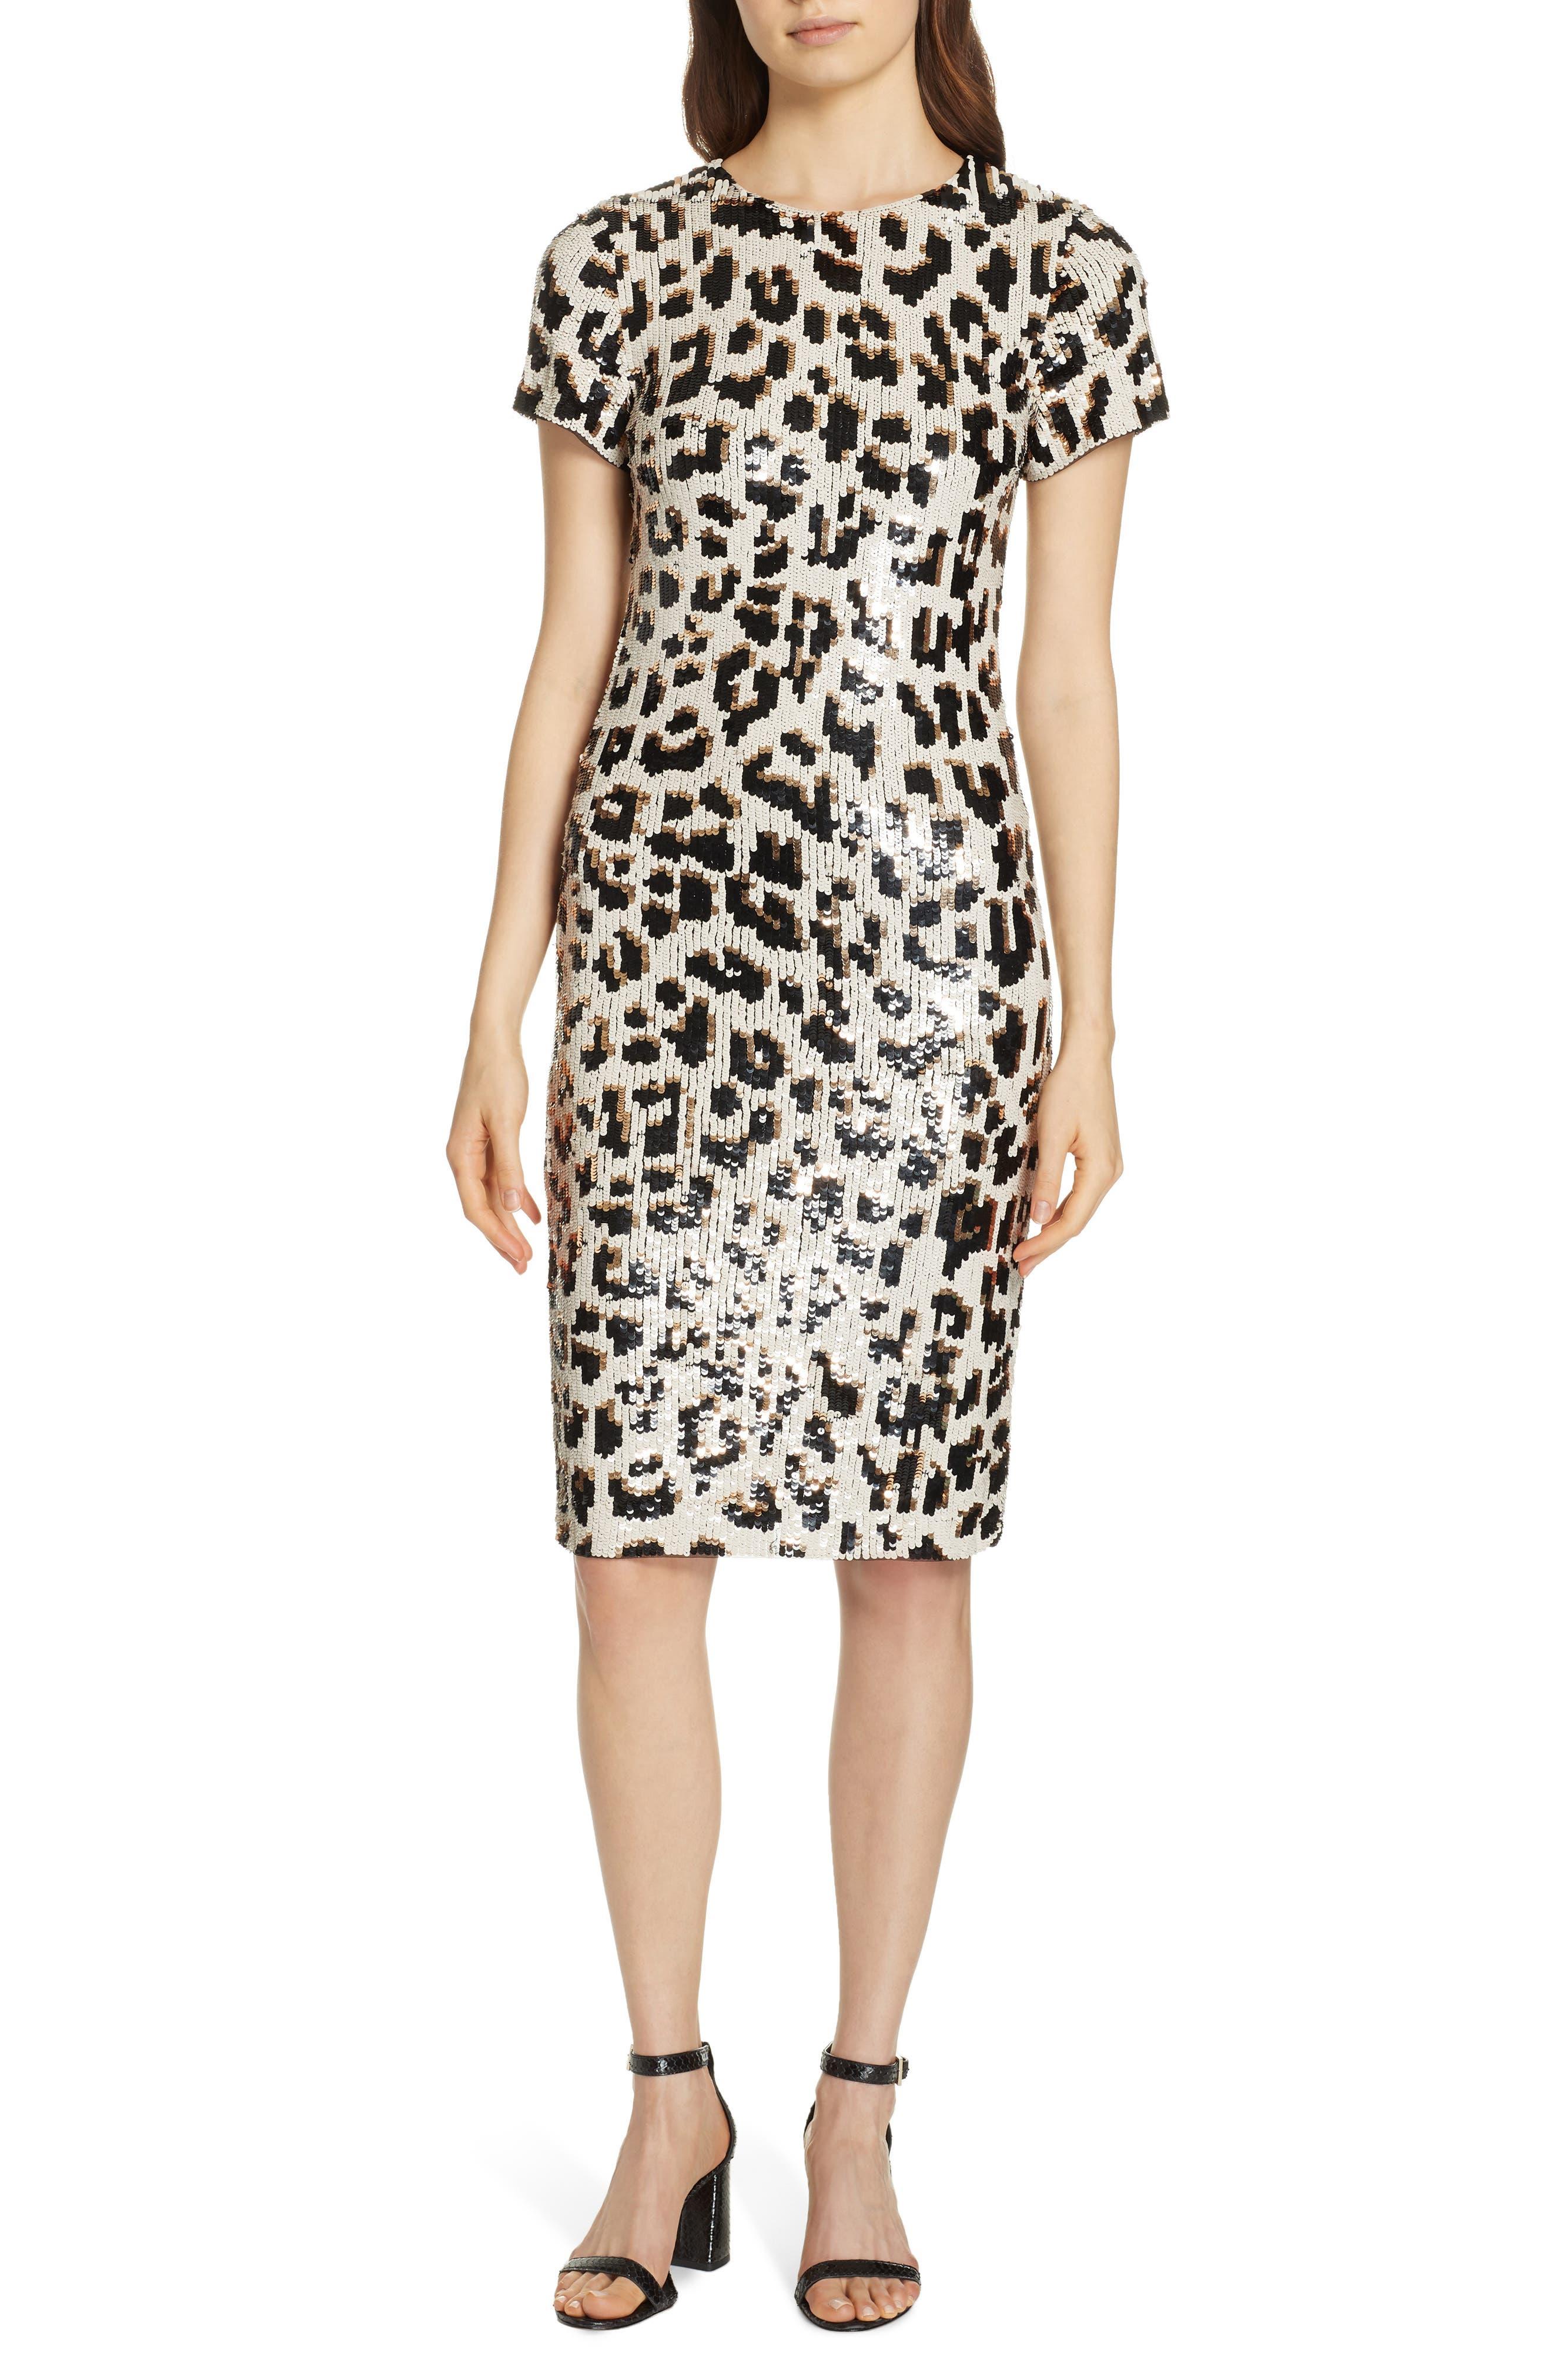 ALICE + OLIVIA,                             Nat Sequin Sheath Dress,                             Alternate thumbnail 5, color,                             LEOPARD